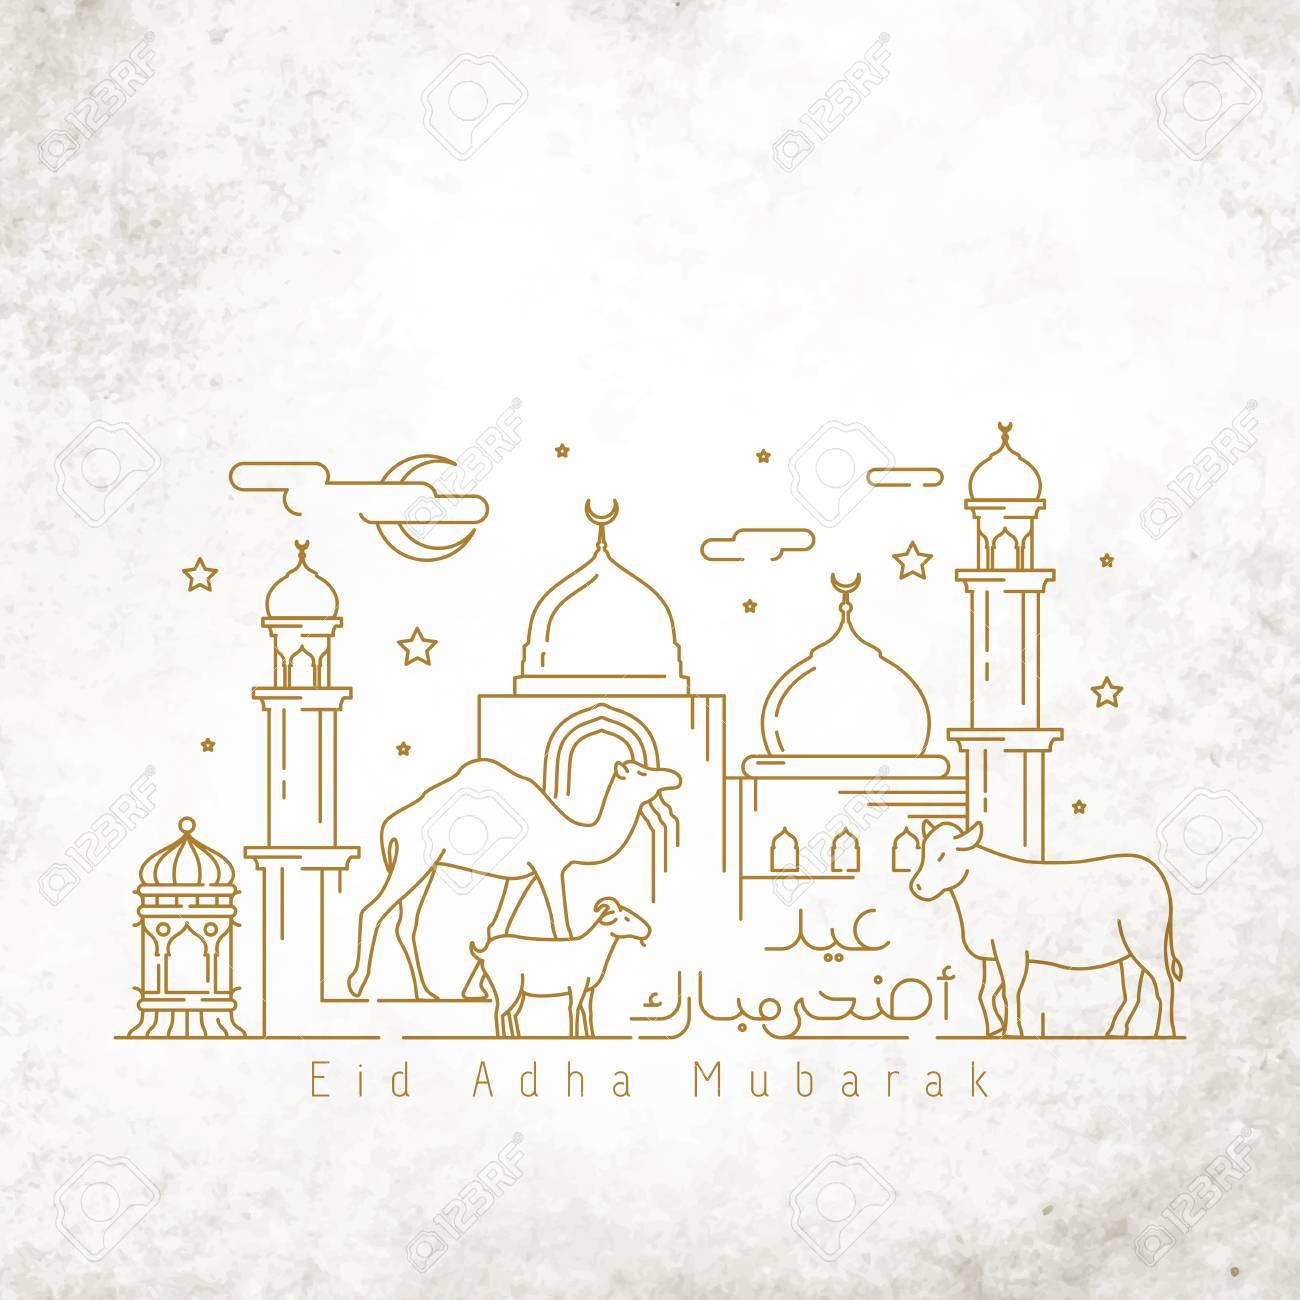 Islamic greeting Happy Eid adha mubarak greeting card template monoline illustration arabic landscape - 101048681